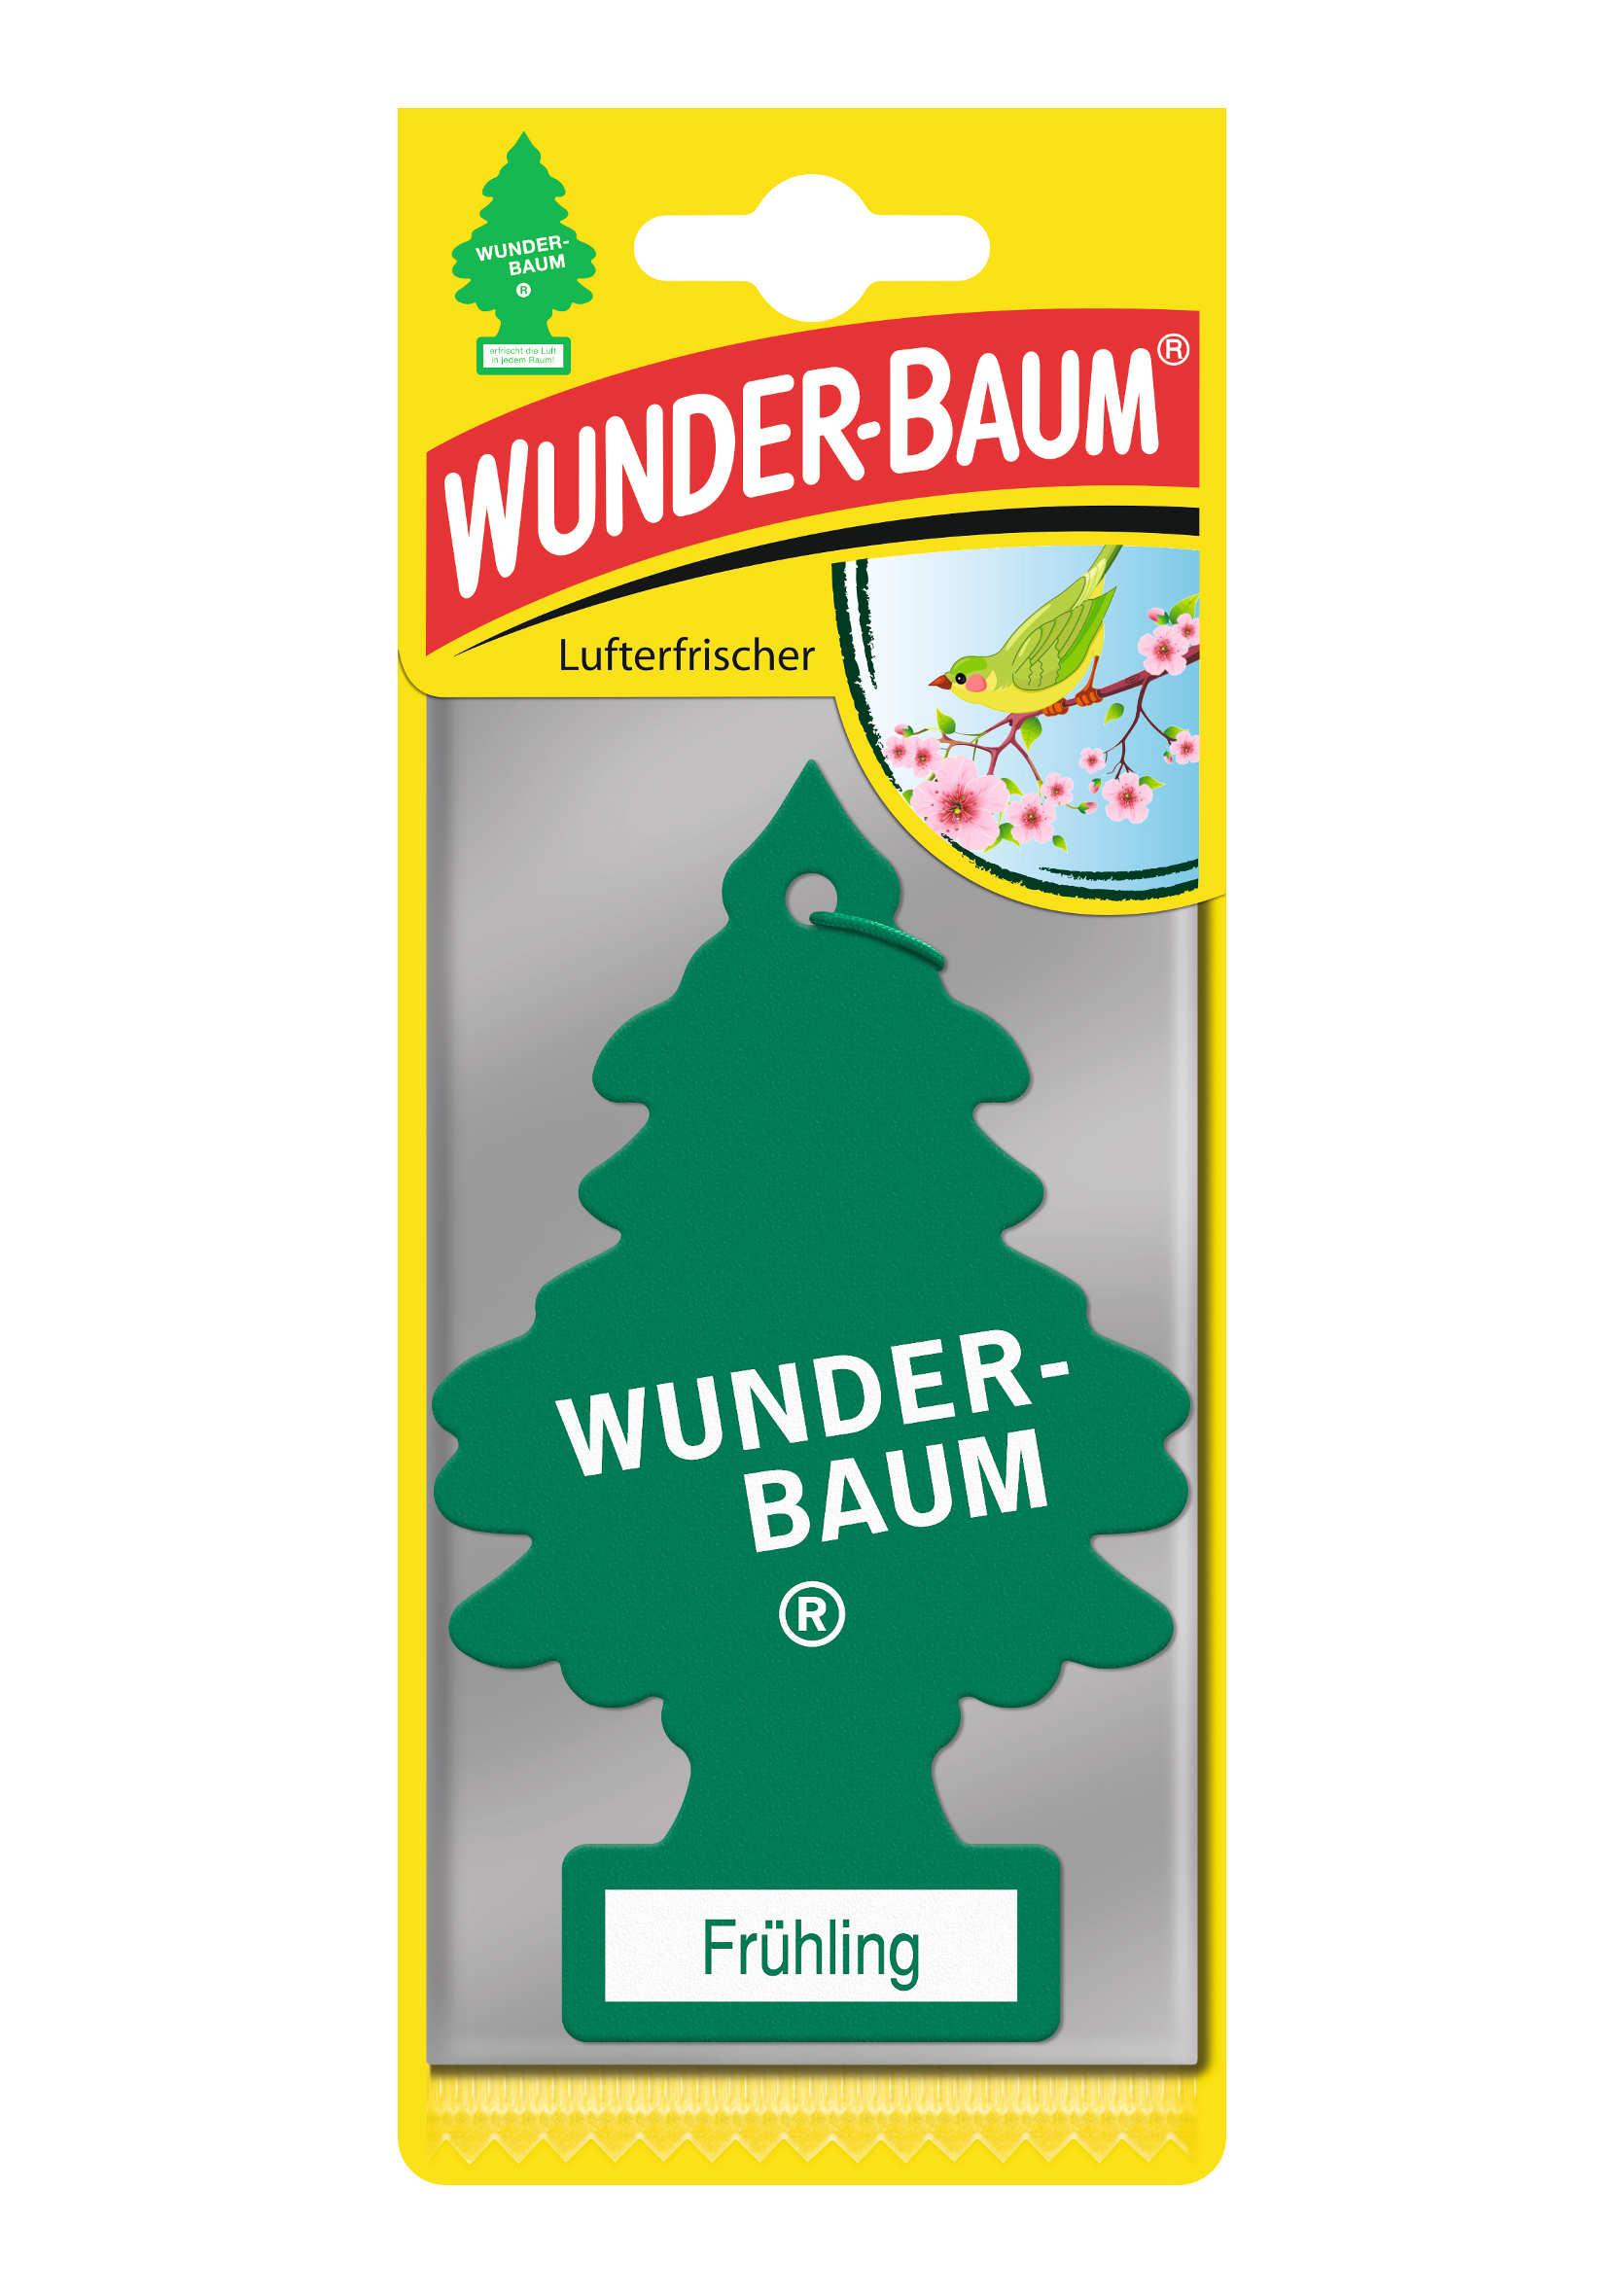 Zapachowa Choinka do auta Wunder Baum Fruhling Wiosenny